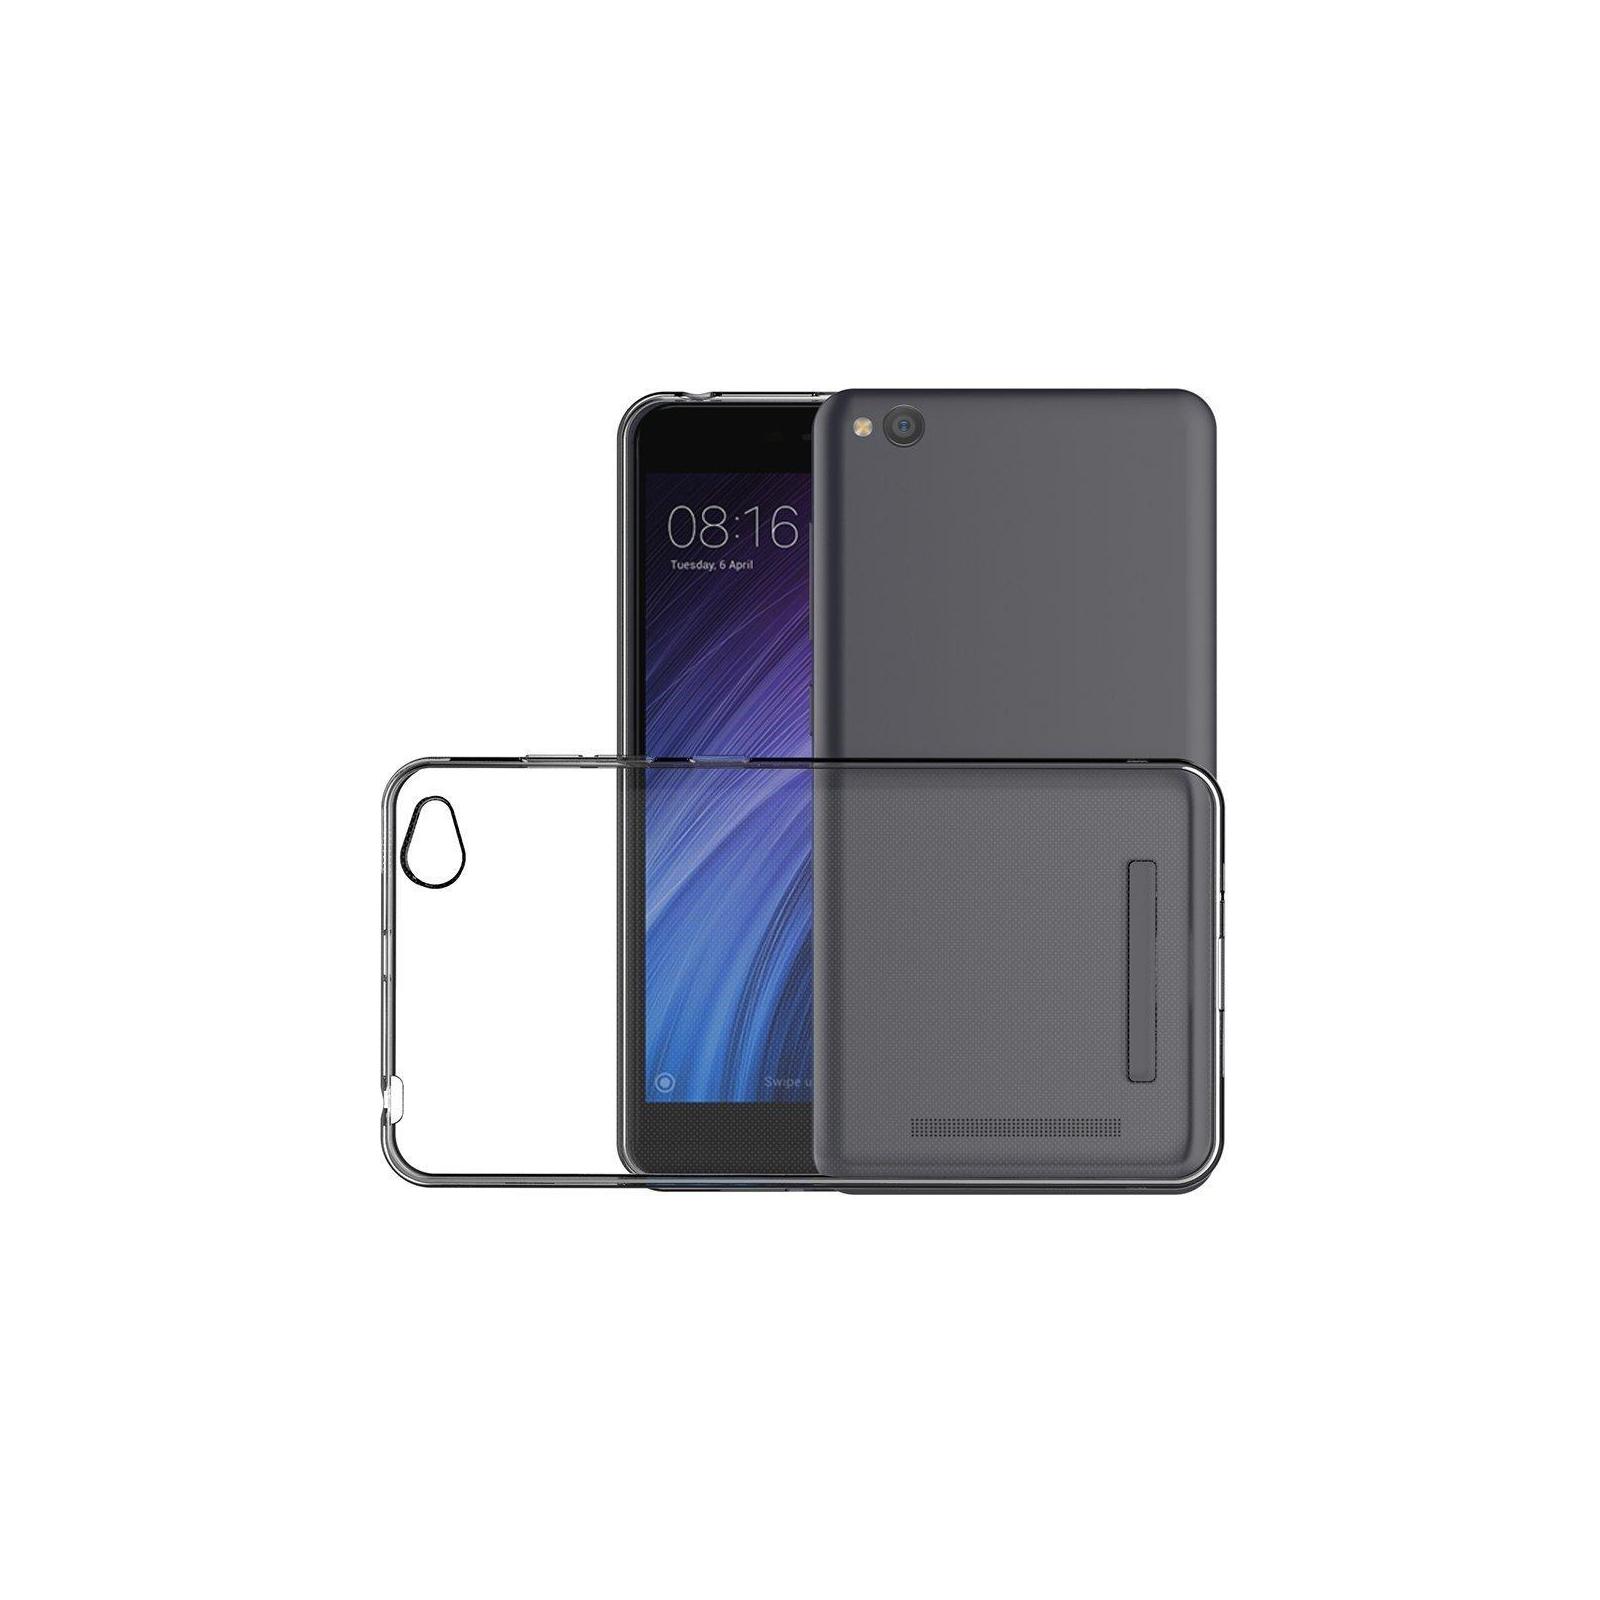 Чехол для моб. телефона Laudtec для Xiaomi Redmi 5A Clear tpu (Transperent) (LC-XR5A) изображение 3